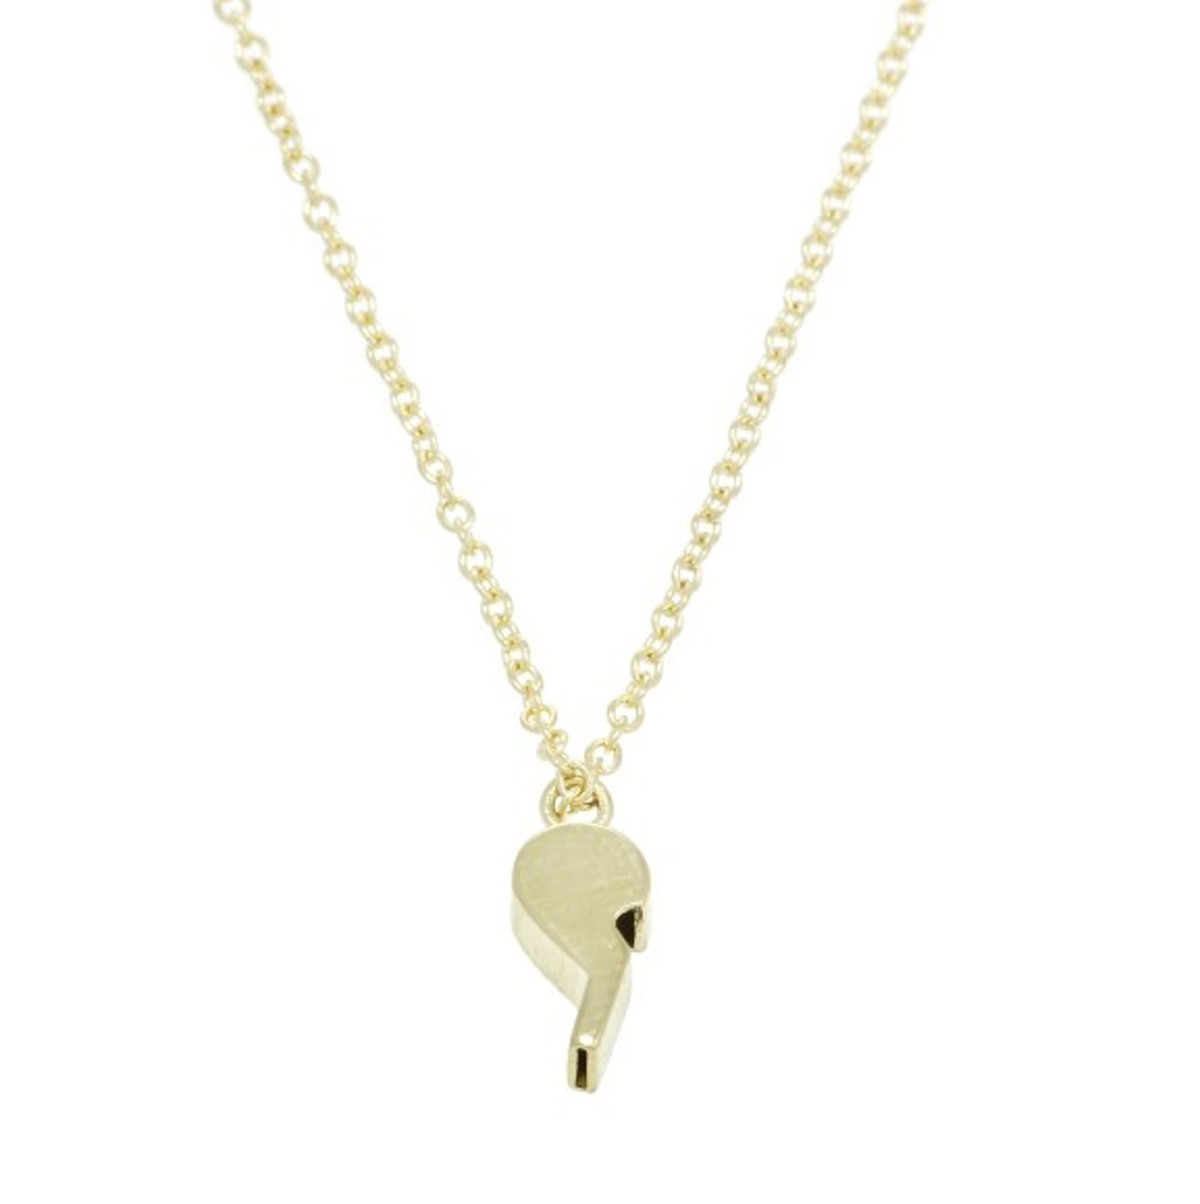 Lauren Klassen 14k yellow gold and diamond tiny whistle necklace